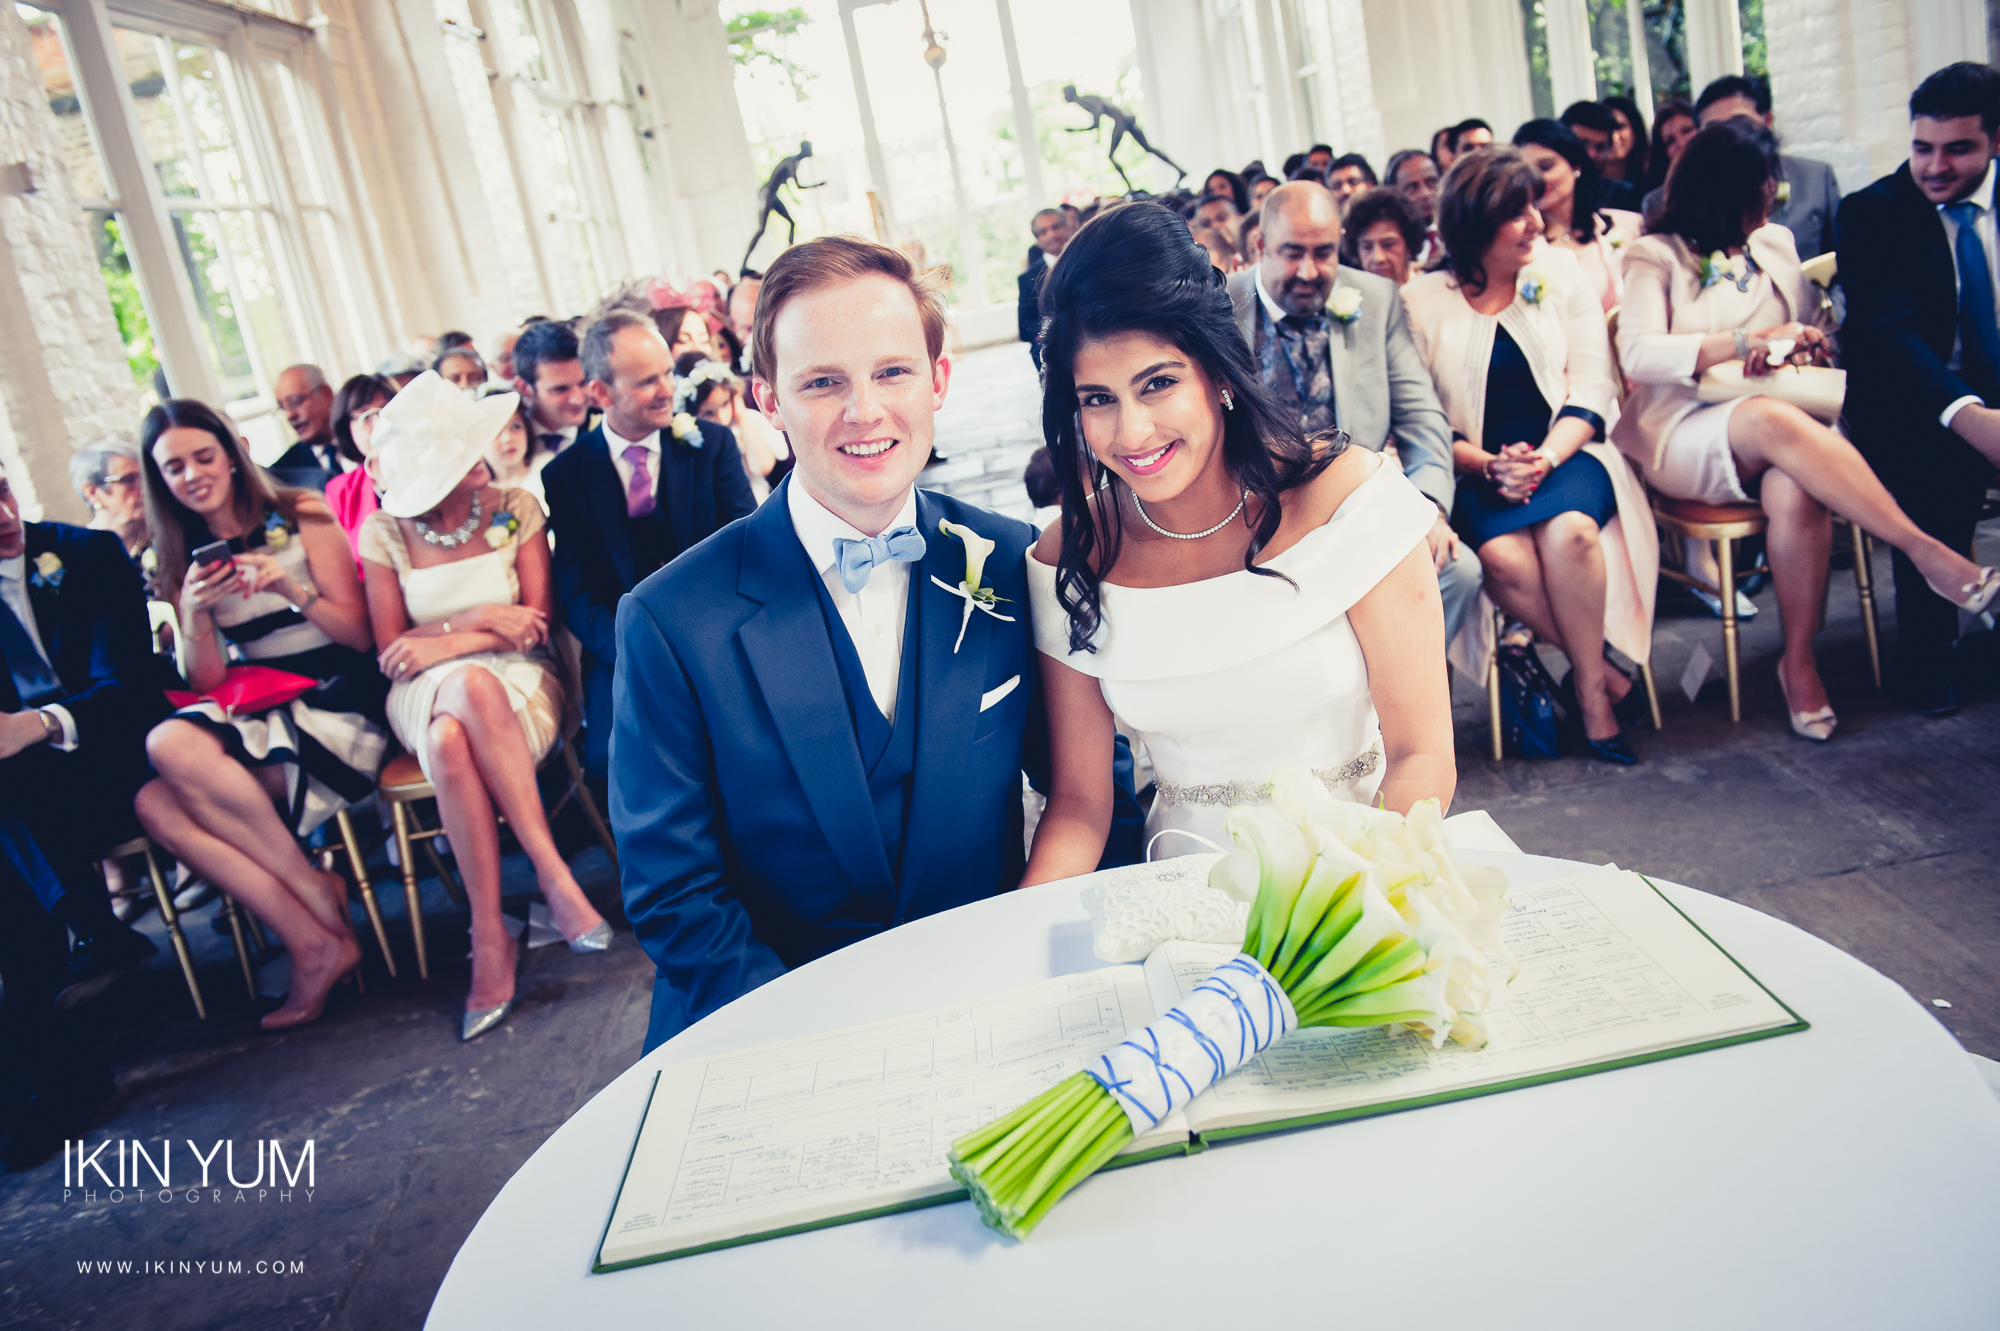 Holland Park Wedding - Ikin Yum Photography-0044.jpg